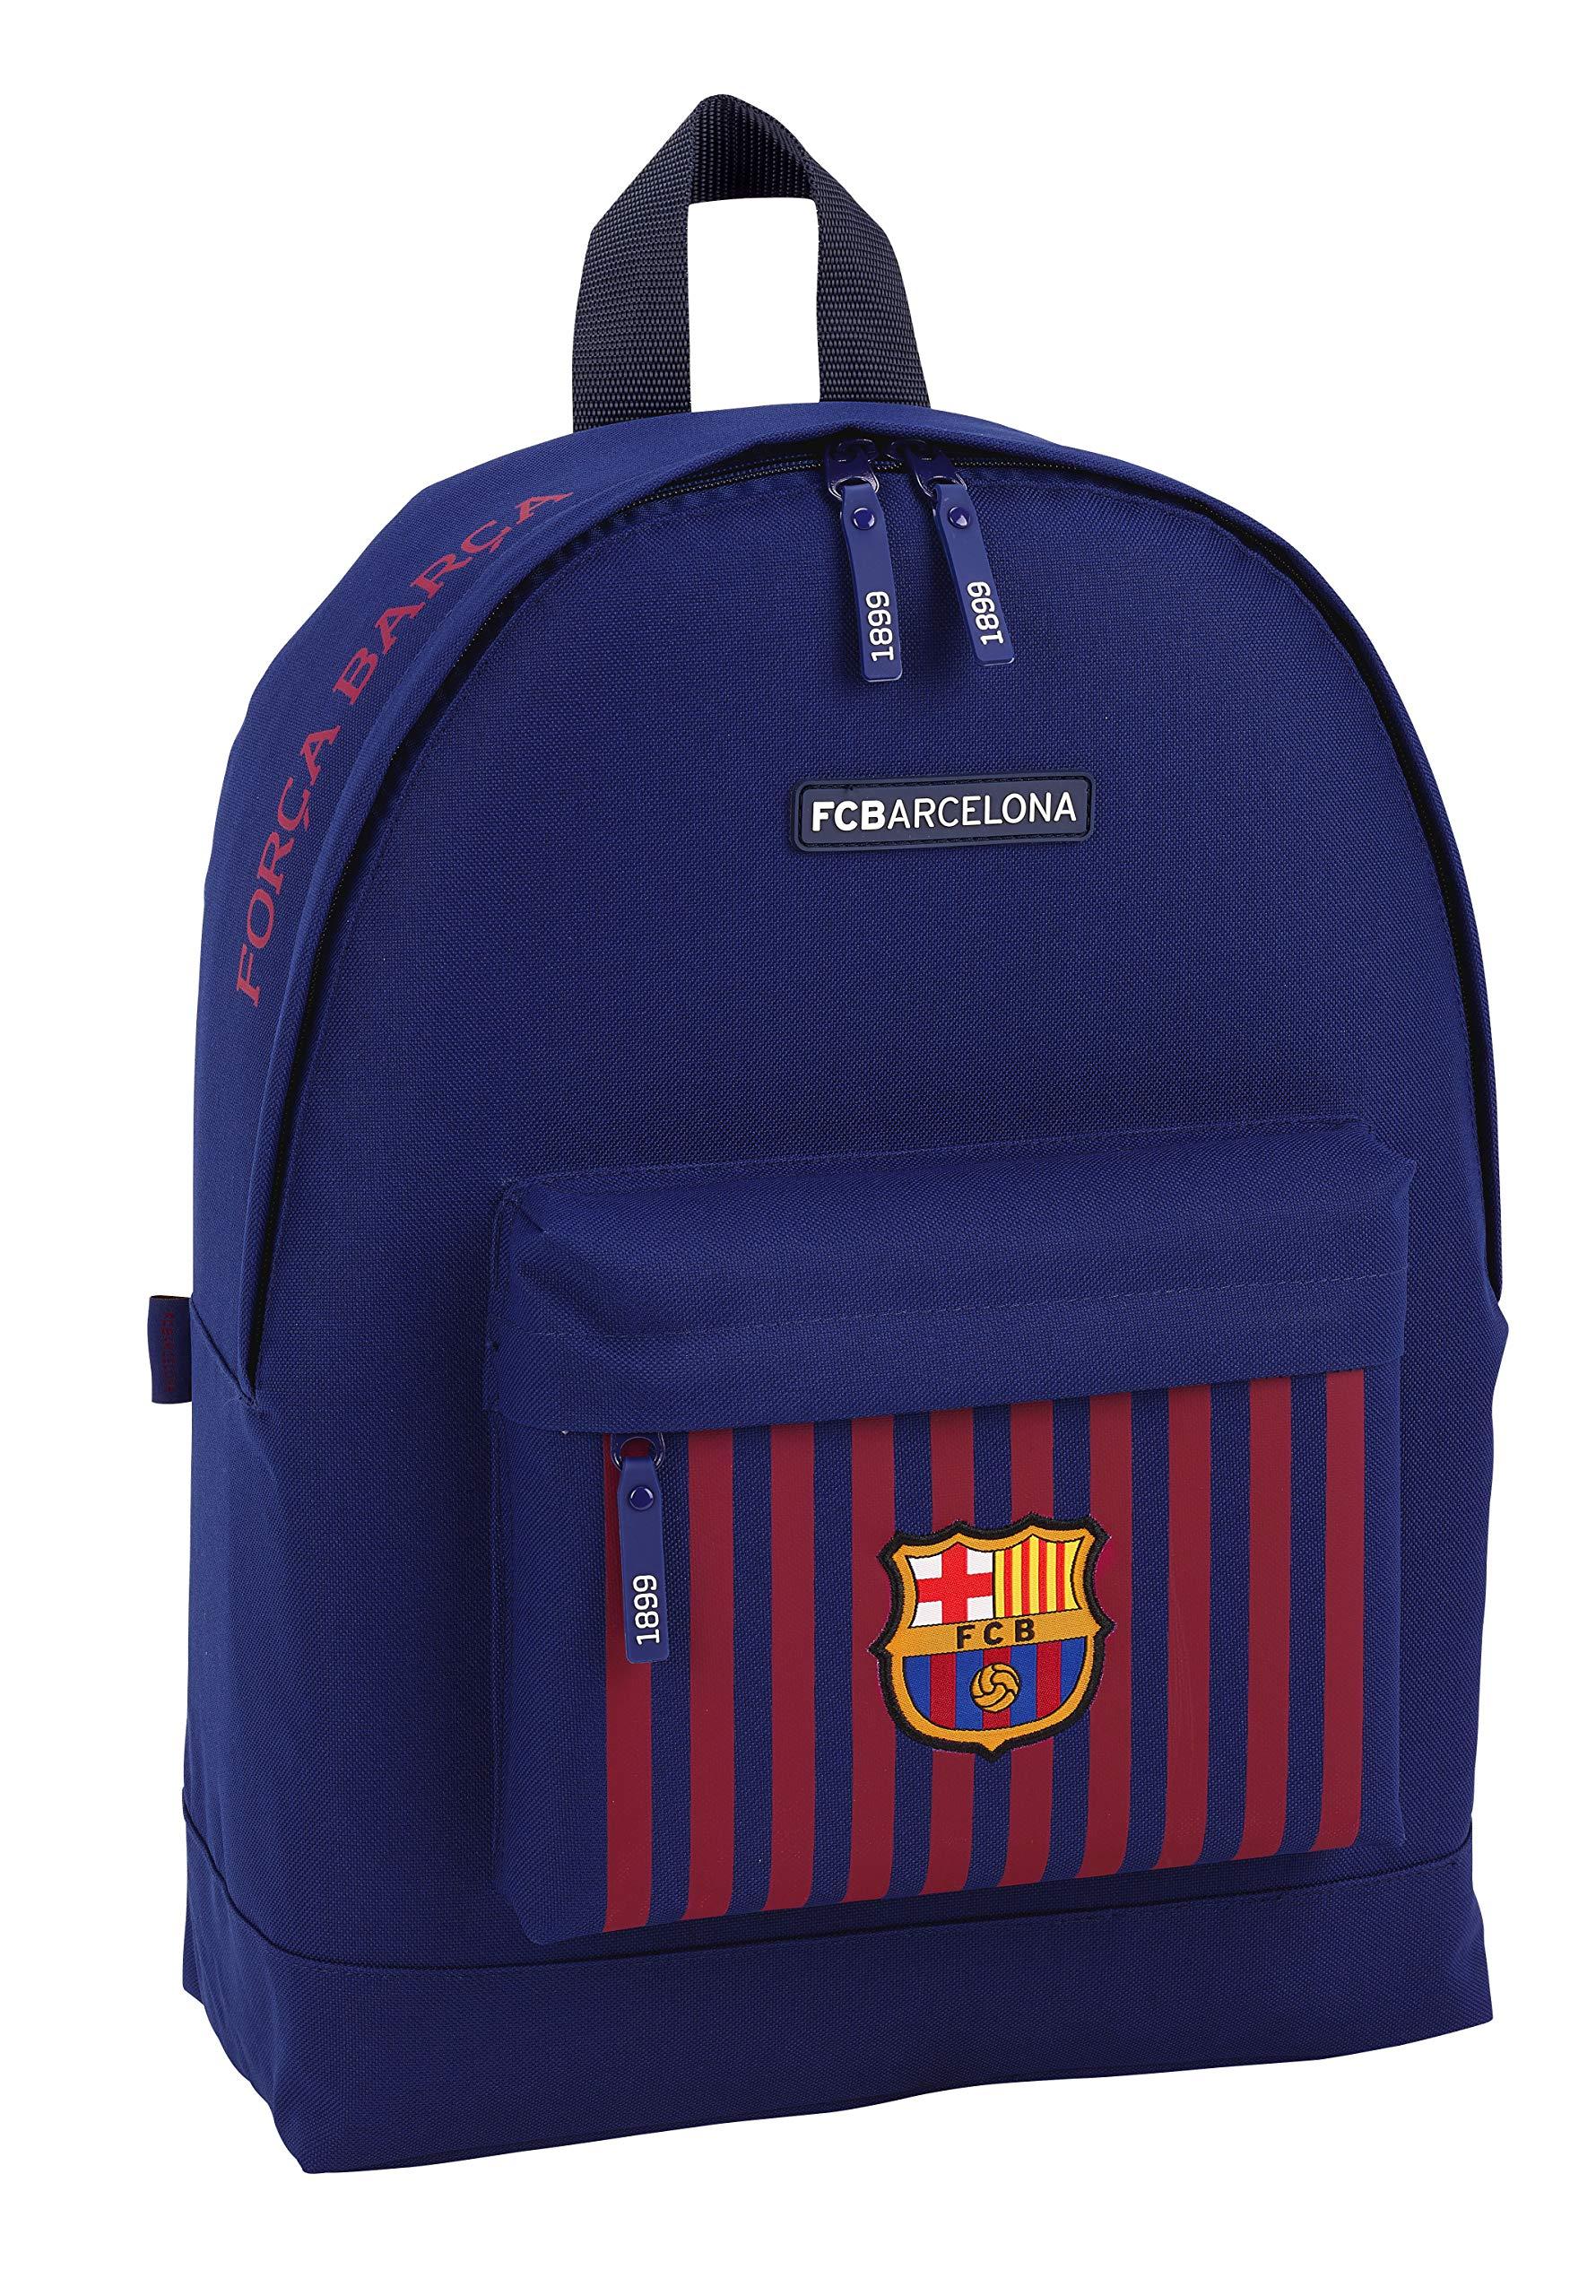 91zEdTtSIzL - FC Barcelona Mochila Grande con Funda Ordenador.